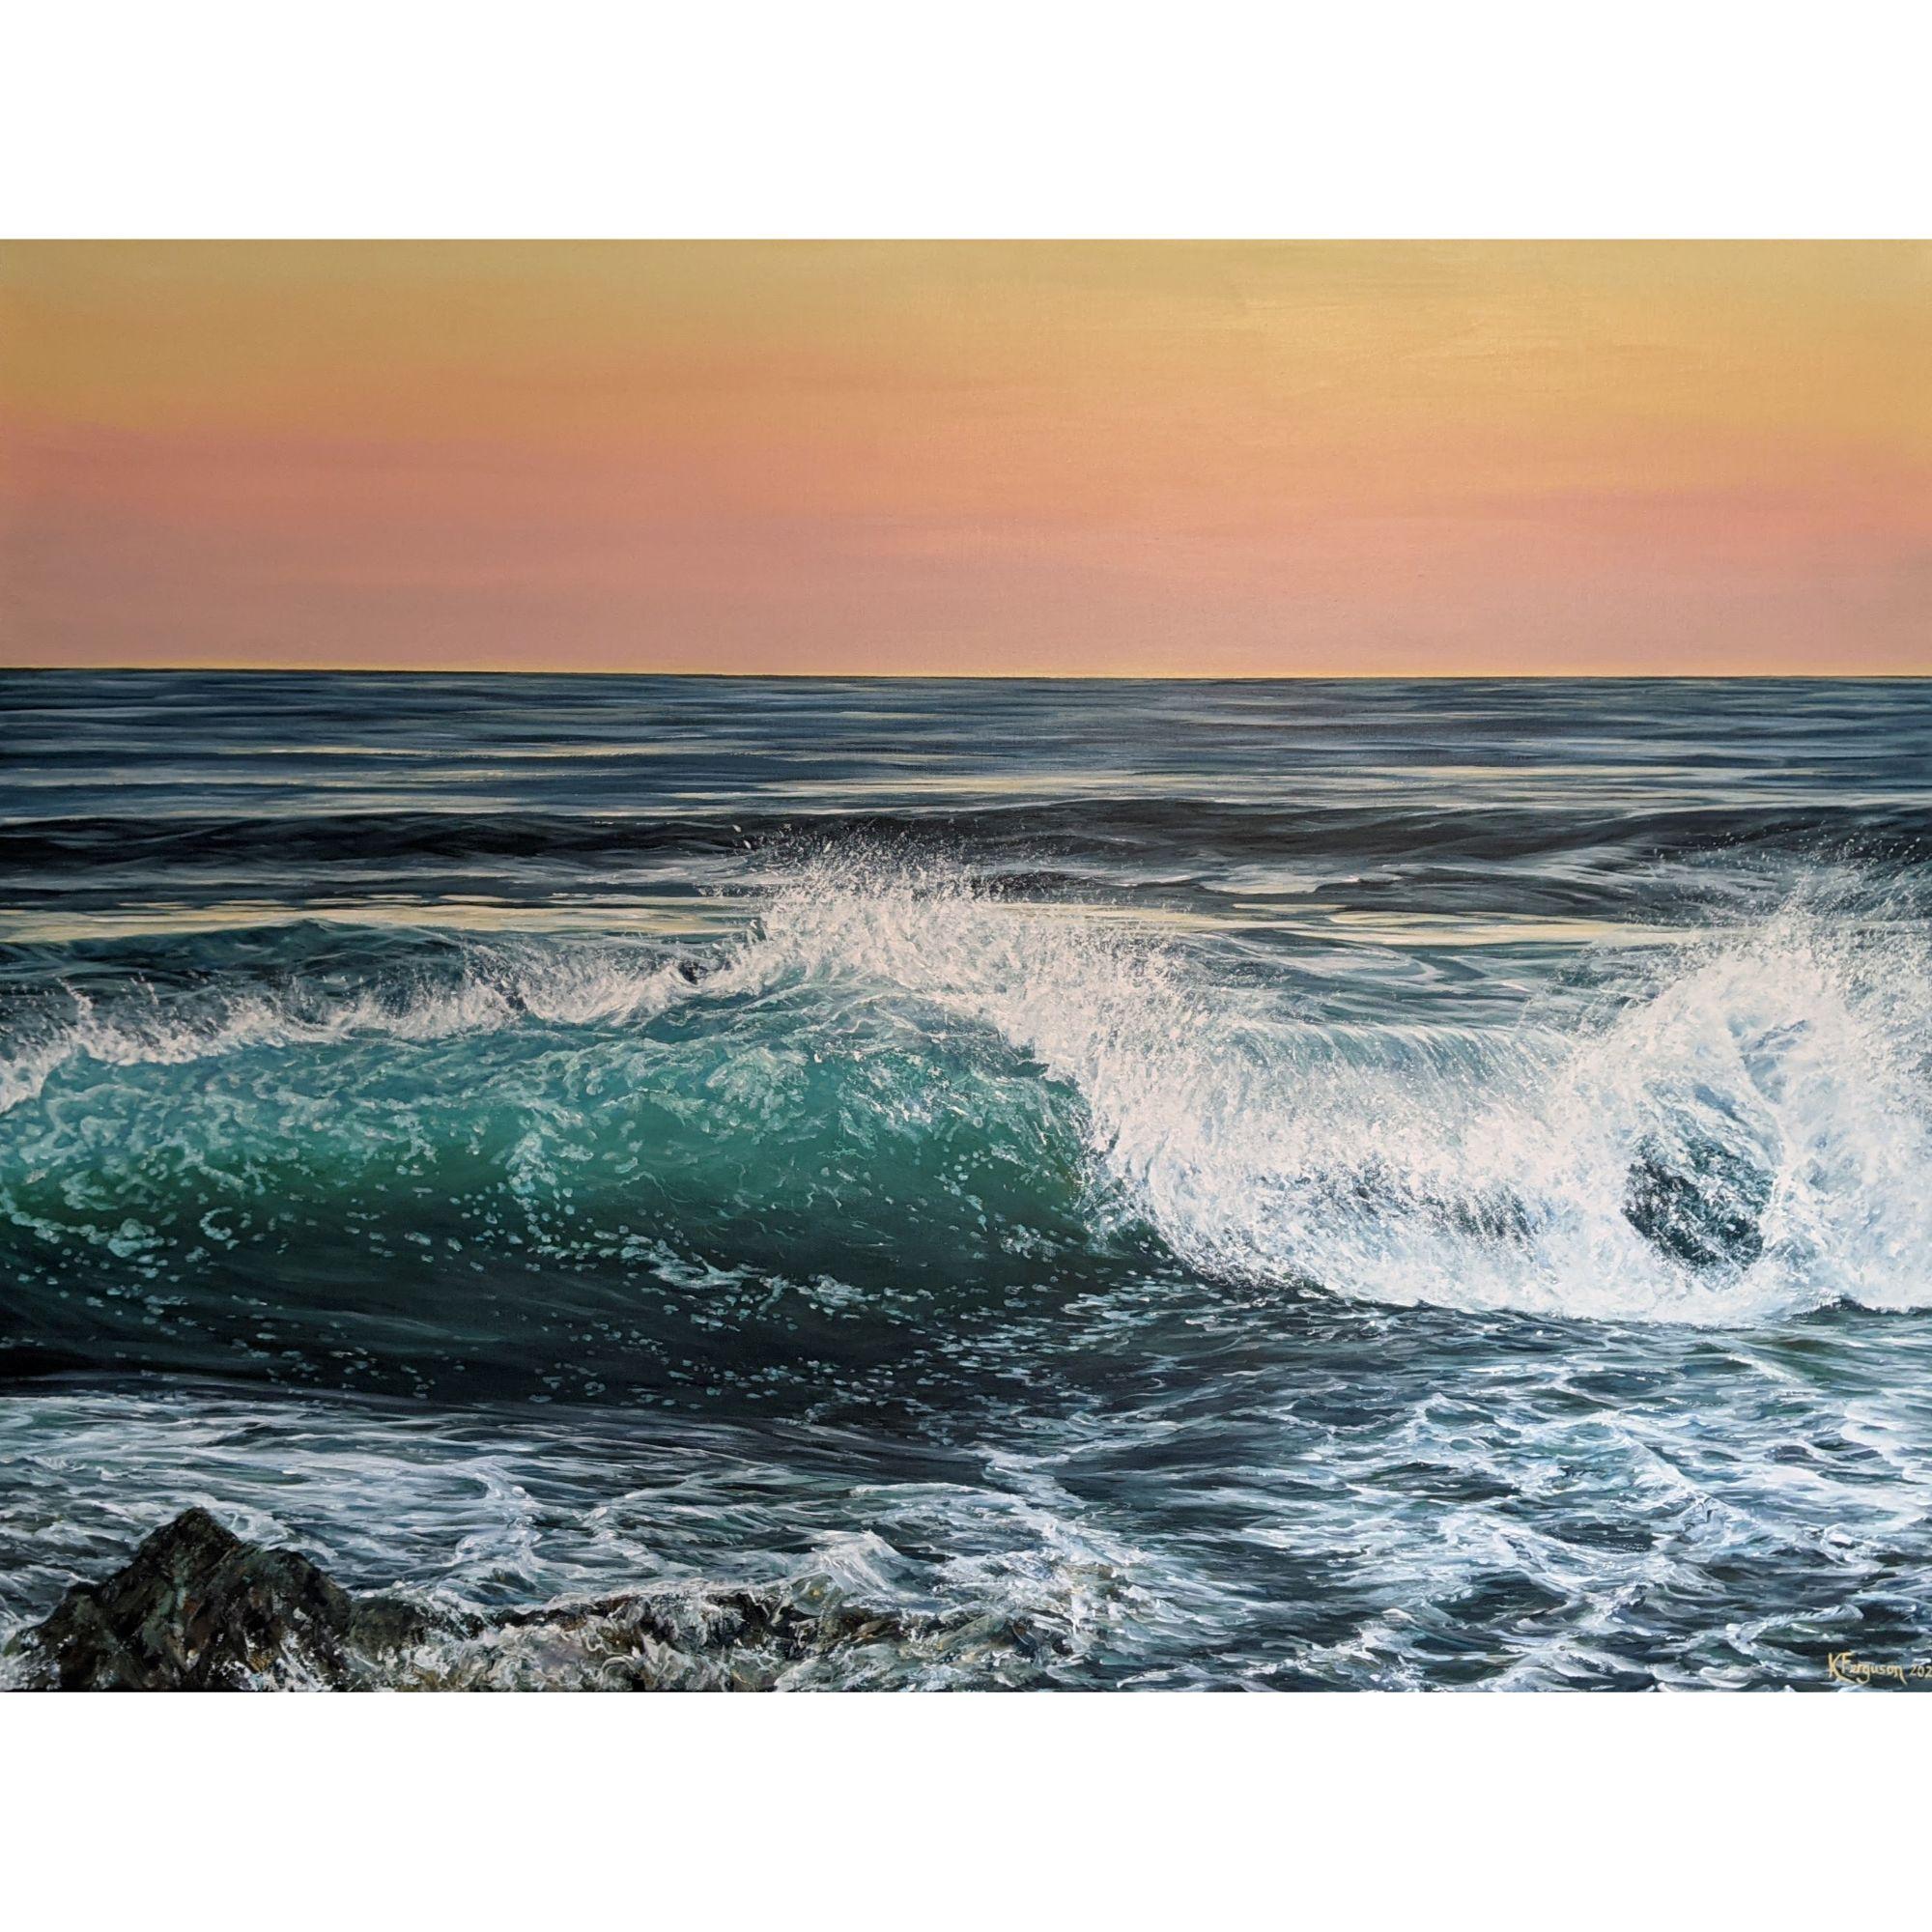 Wave at Daybreak #2